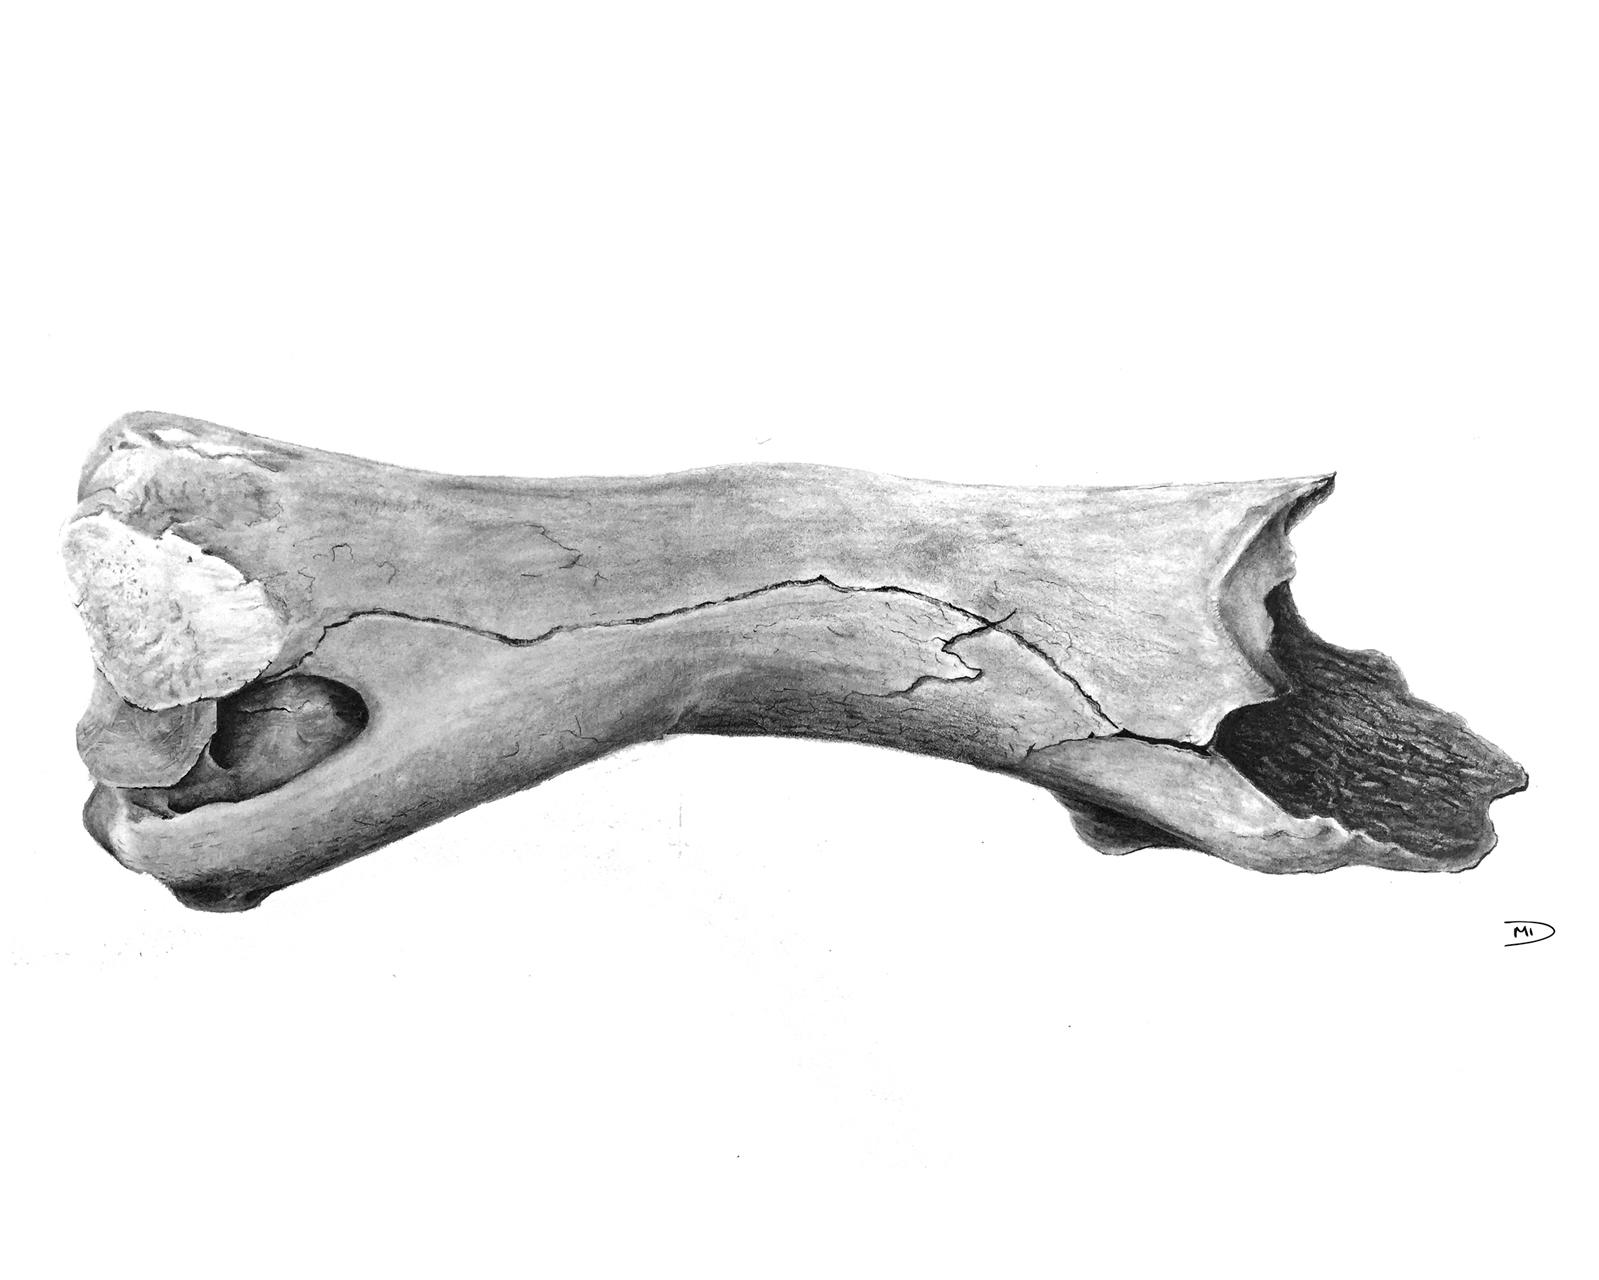 Misha Donohoe,  Bison priscus , 2017. Graphite on Strathmore Bristol Paper. 70 x 30 cm.